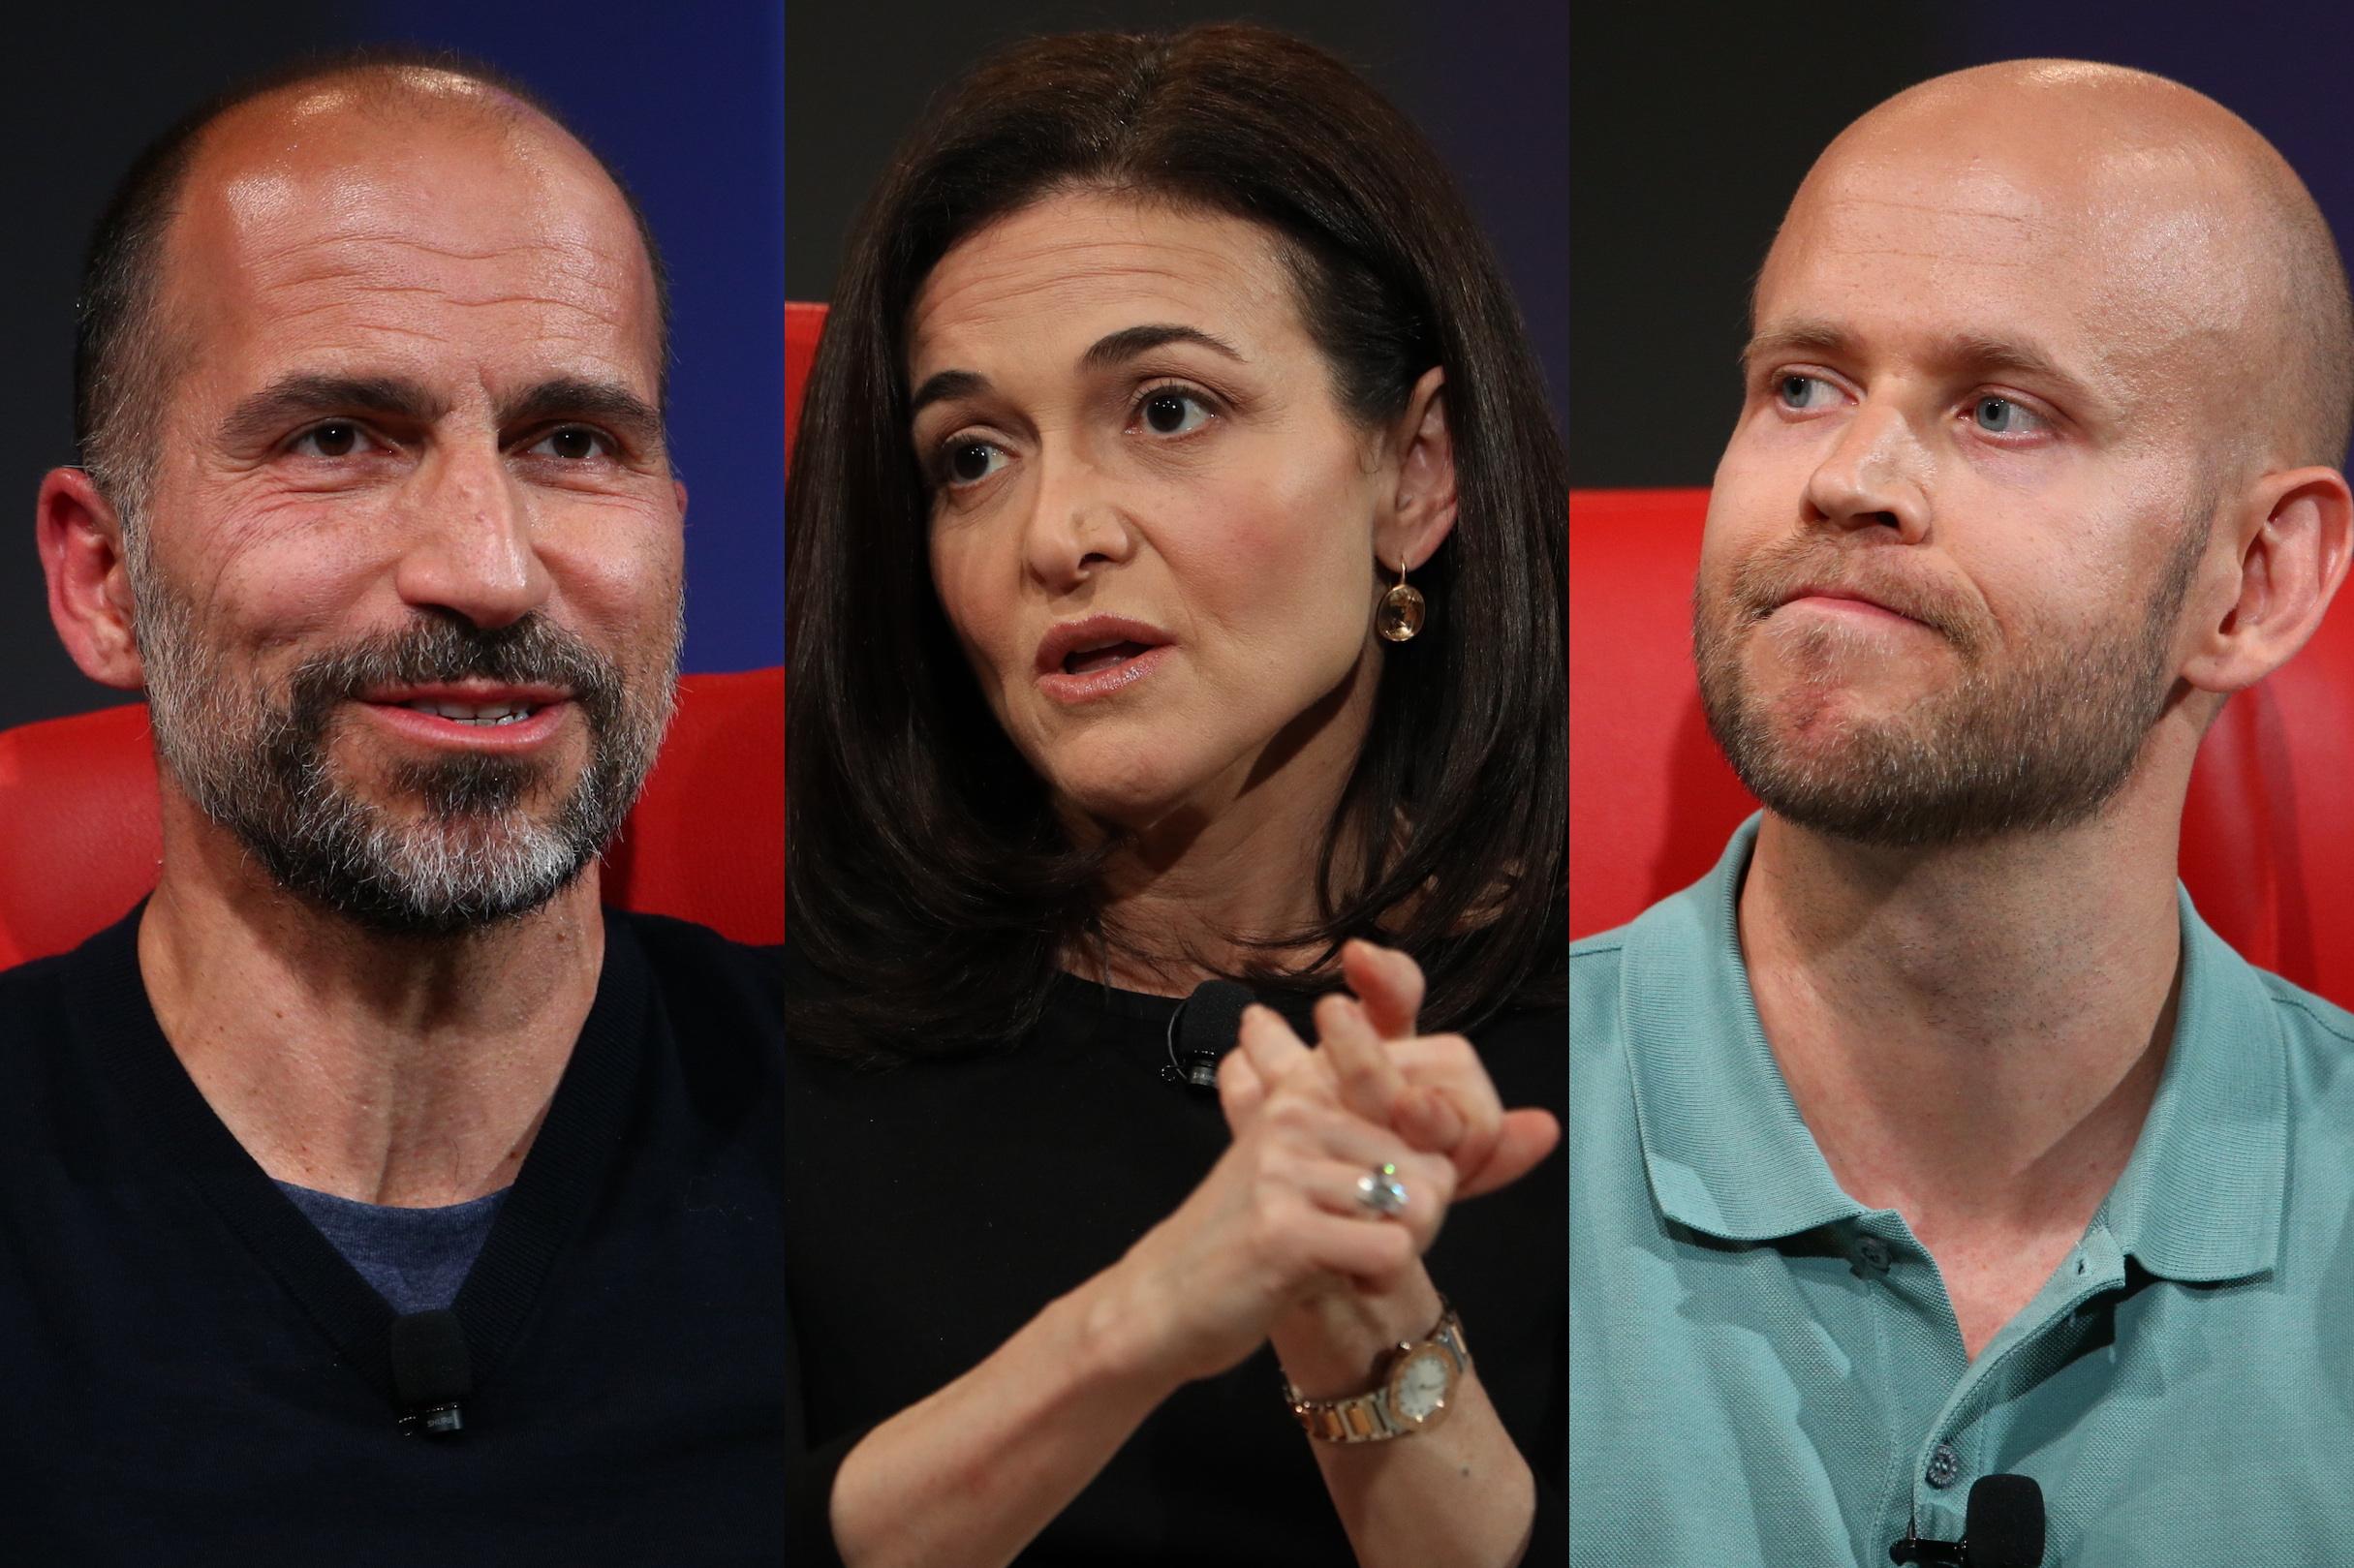 Uber CEO Dara Khosrowshahi, Facebook COO Sheryl Sandberg and Spotify CEO Daniel Ek at the 2018 Code Conference